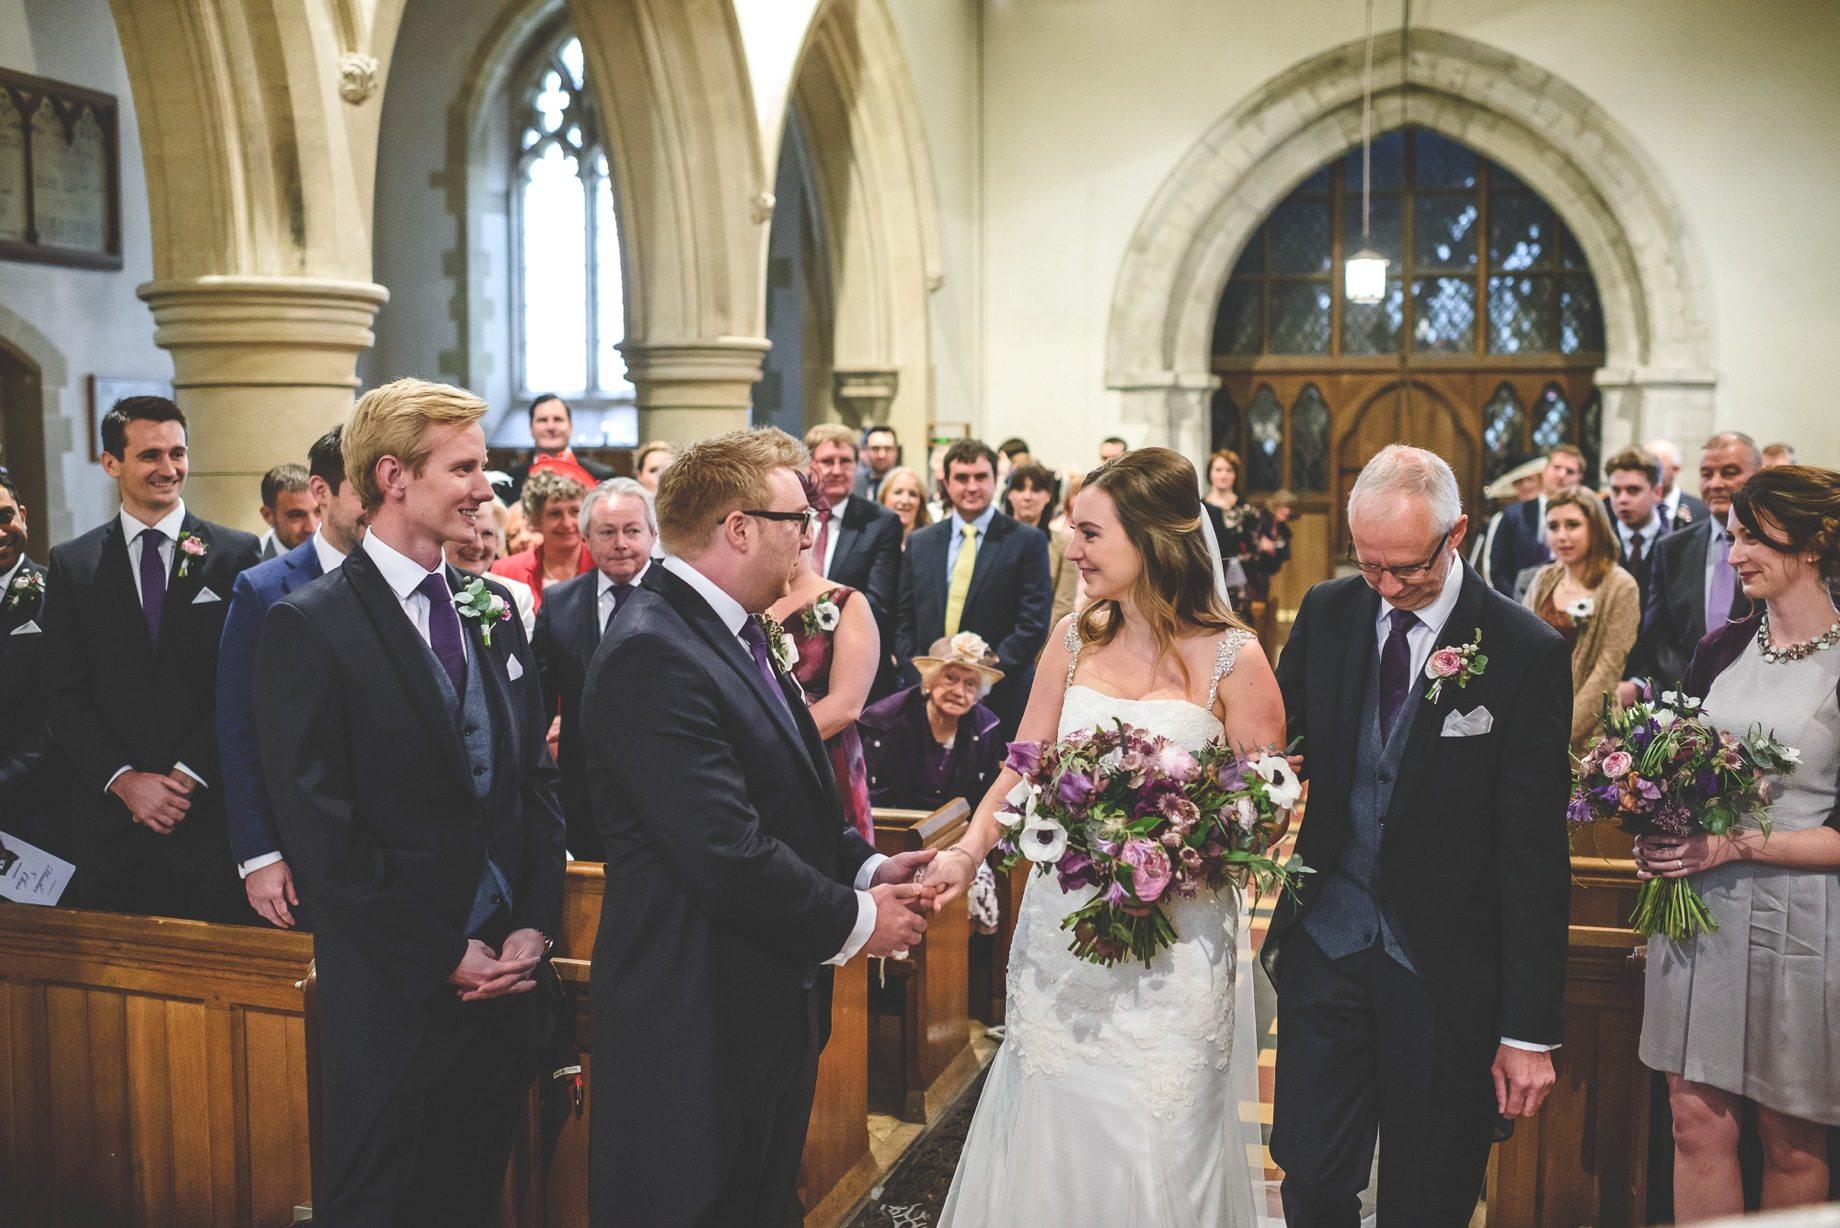 Heather and Chris - Hampshire wedding photography (65 of 174)